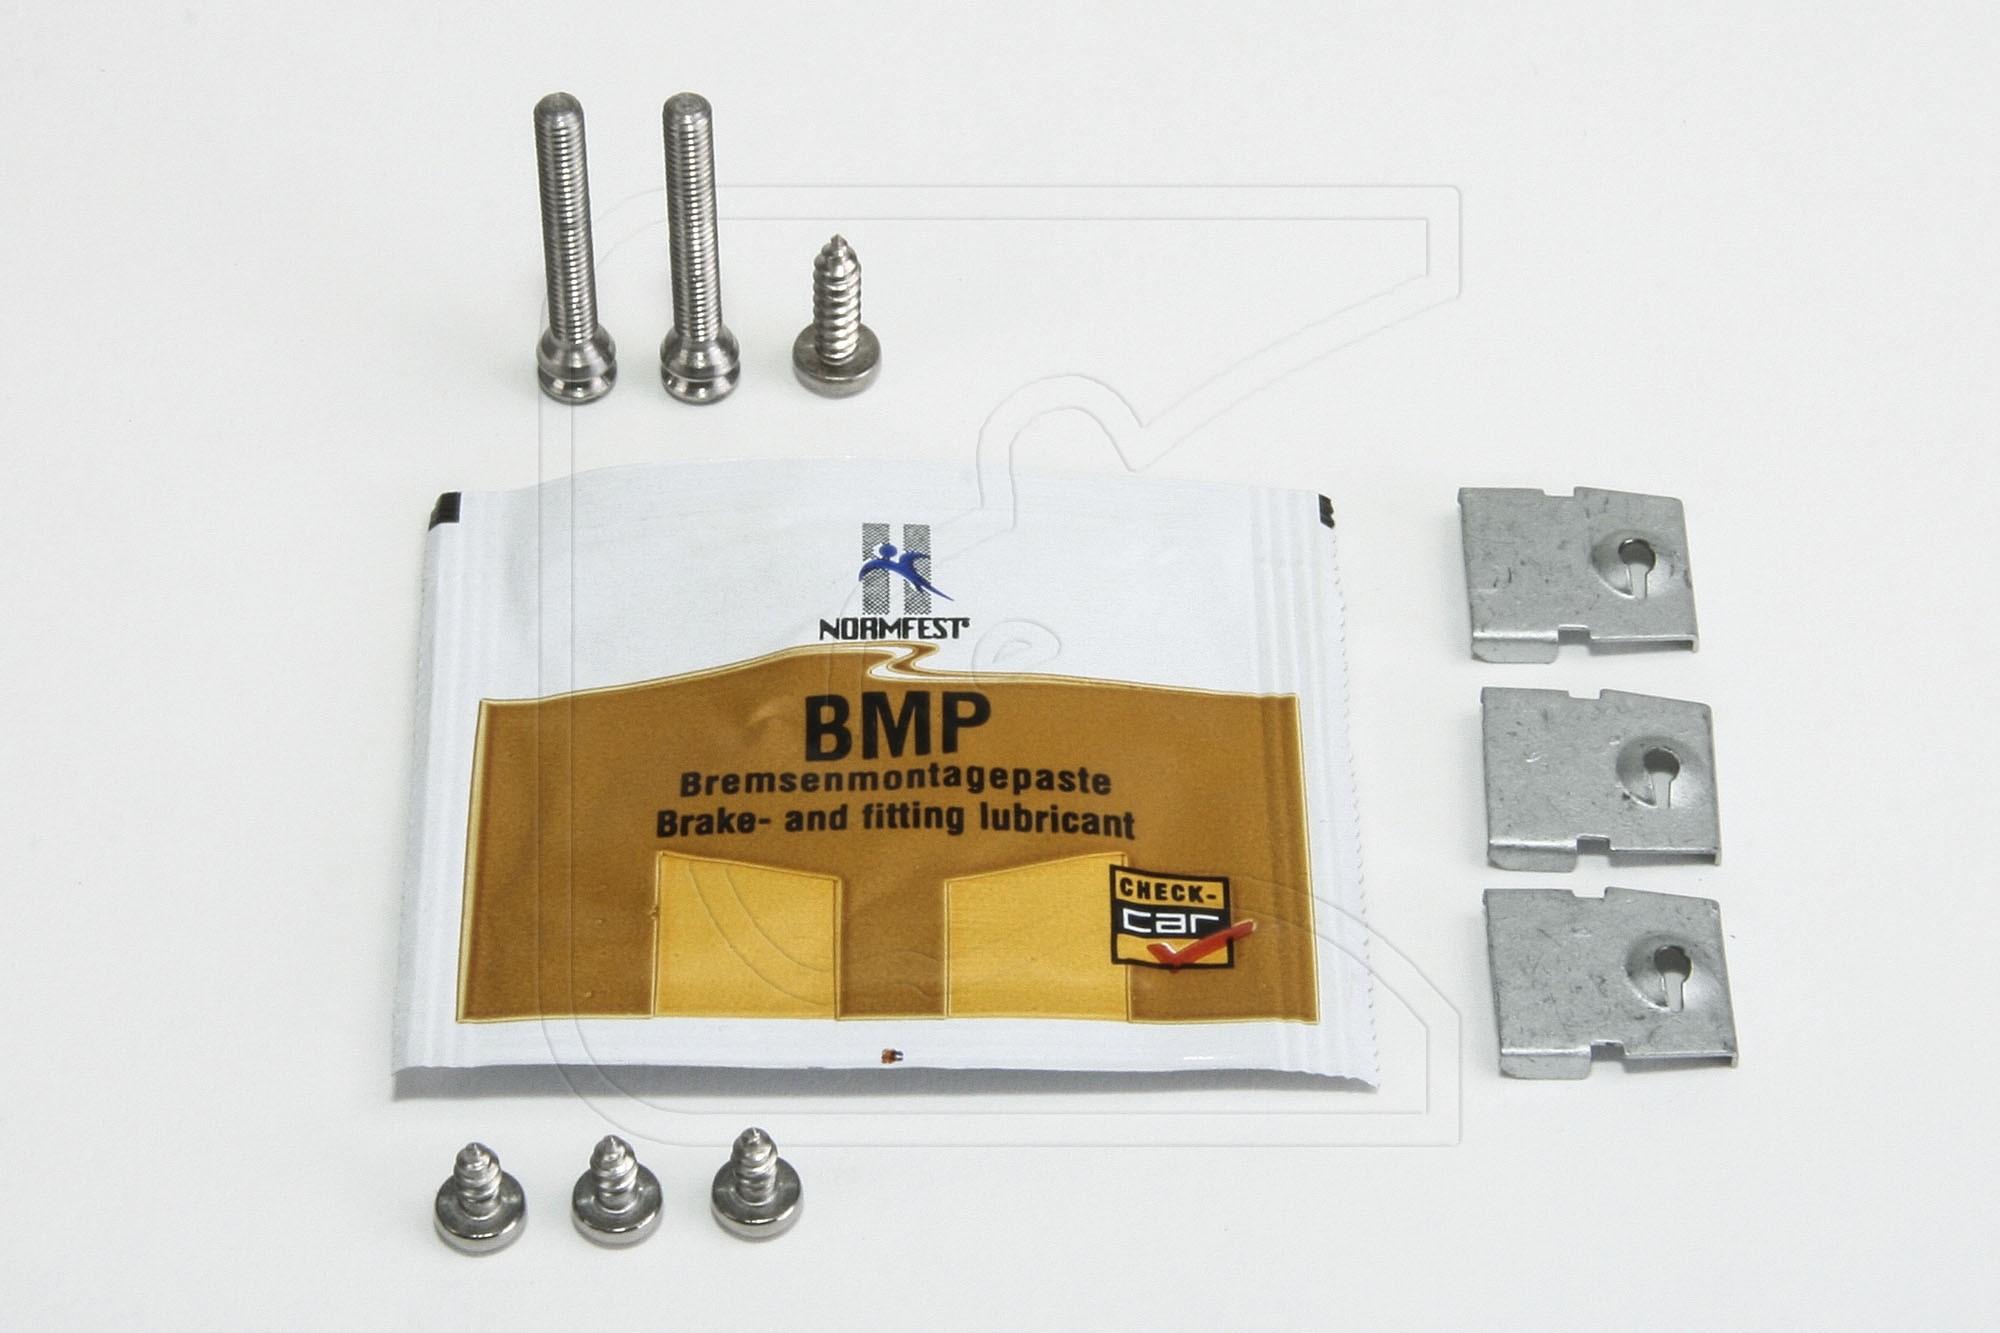 Headlight mounting kit stainless steel for Land Rover Defender